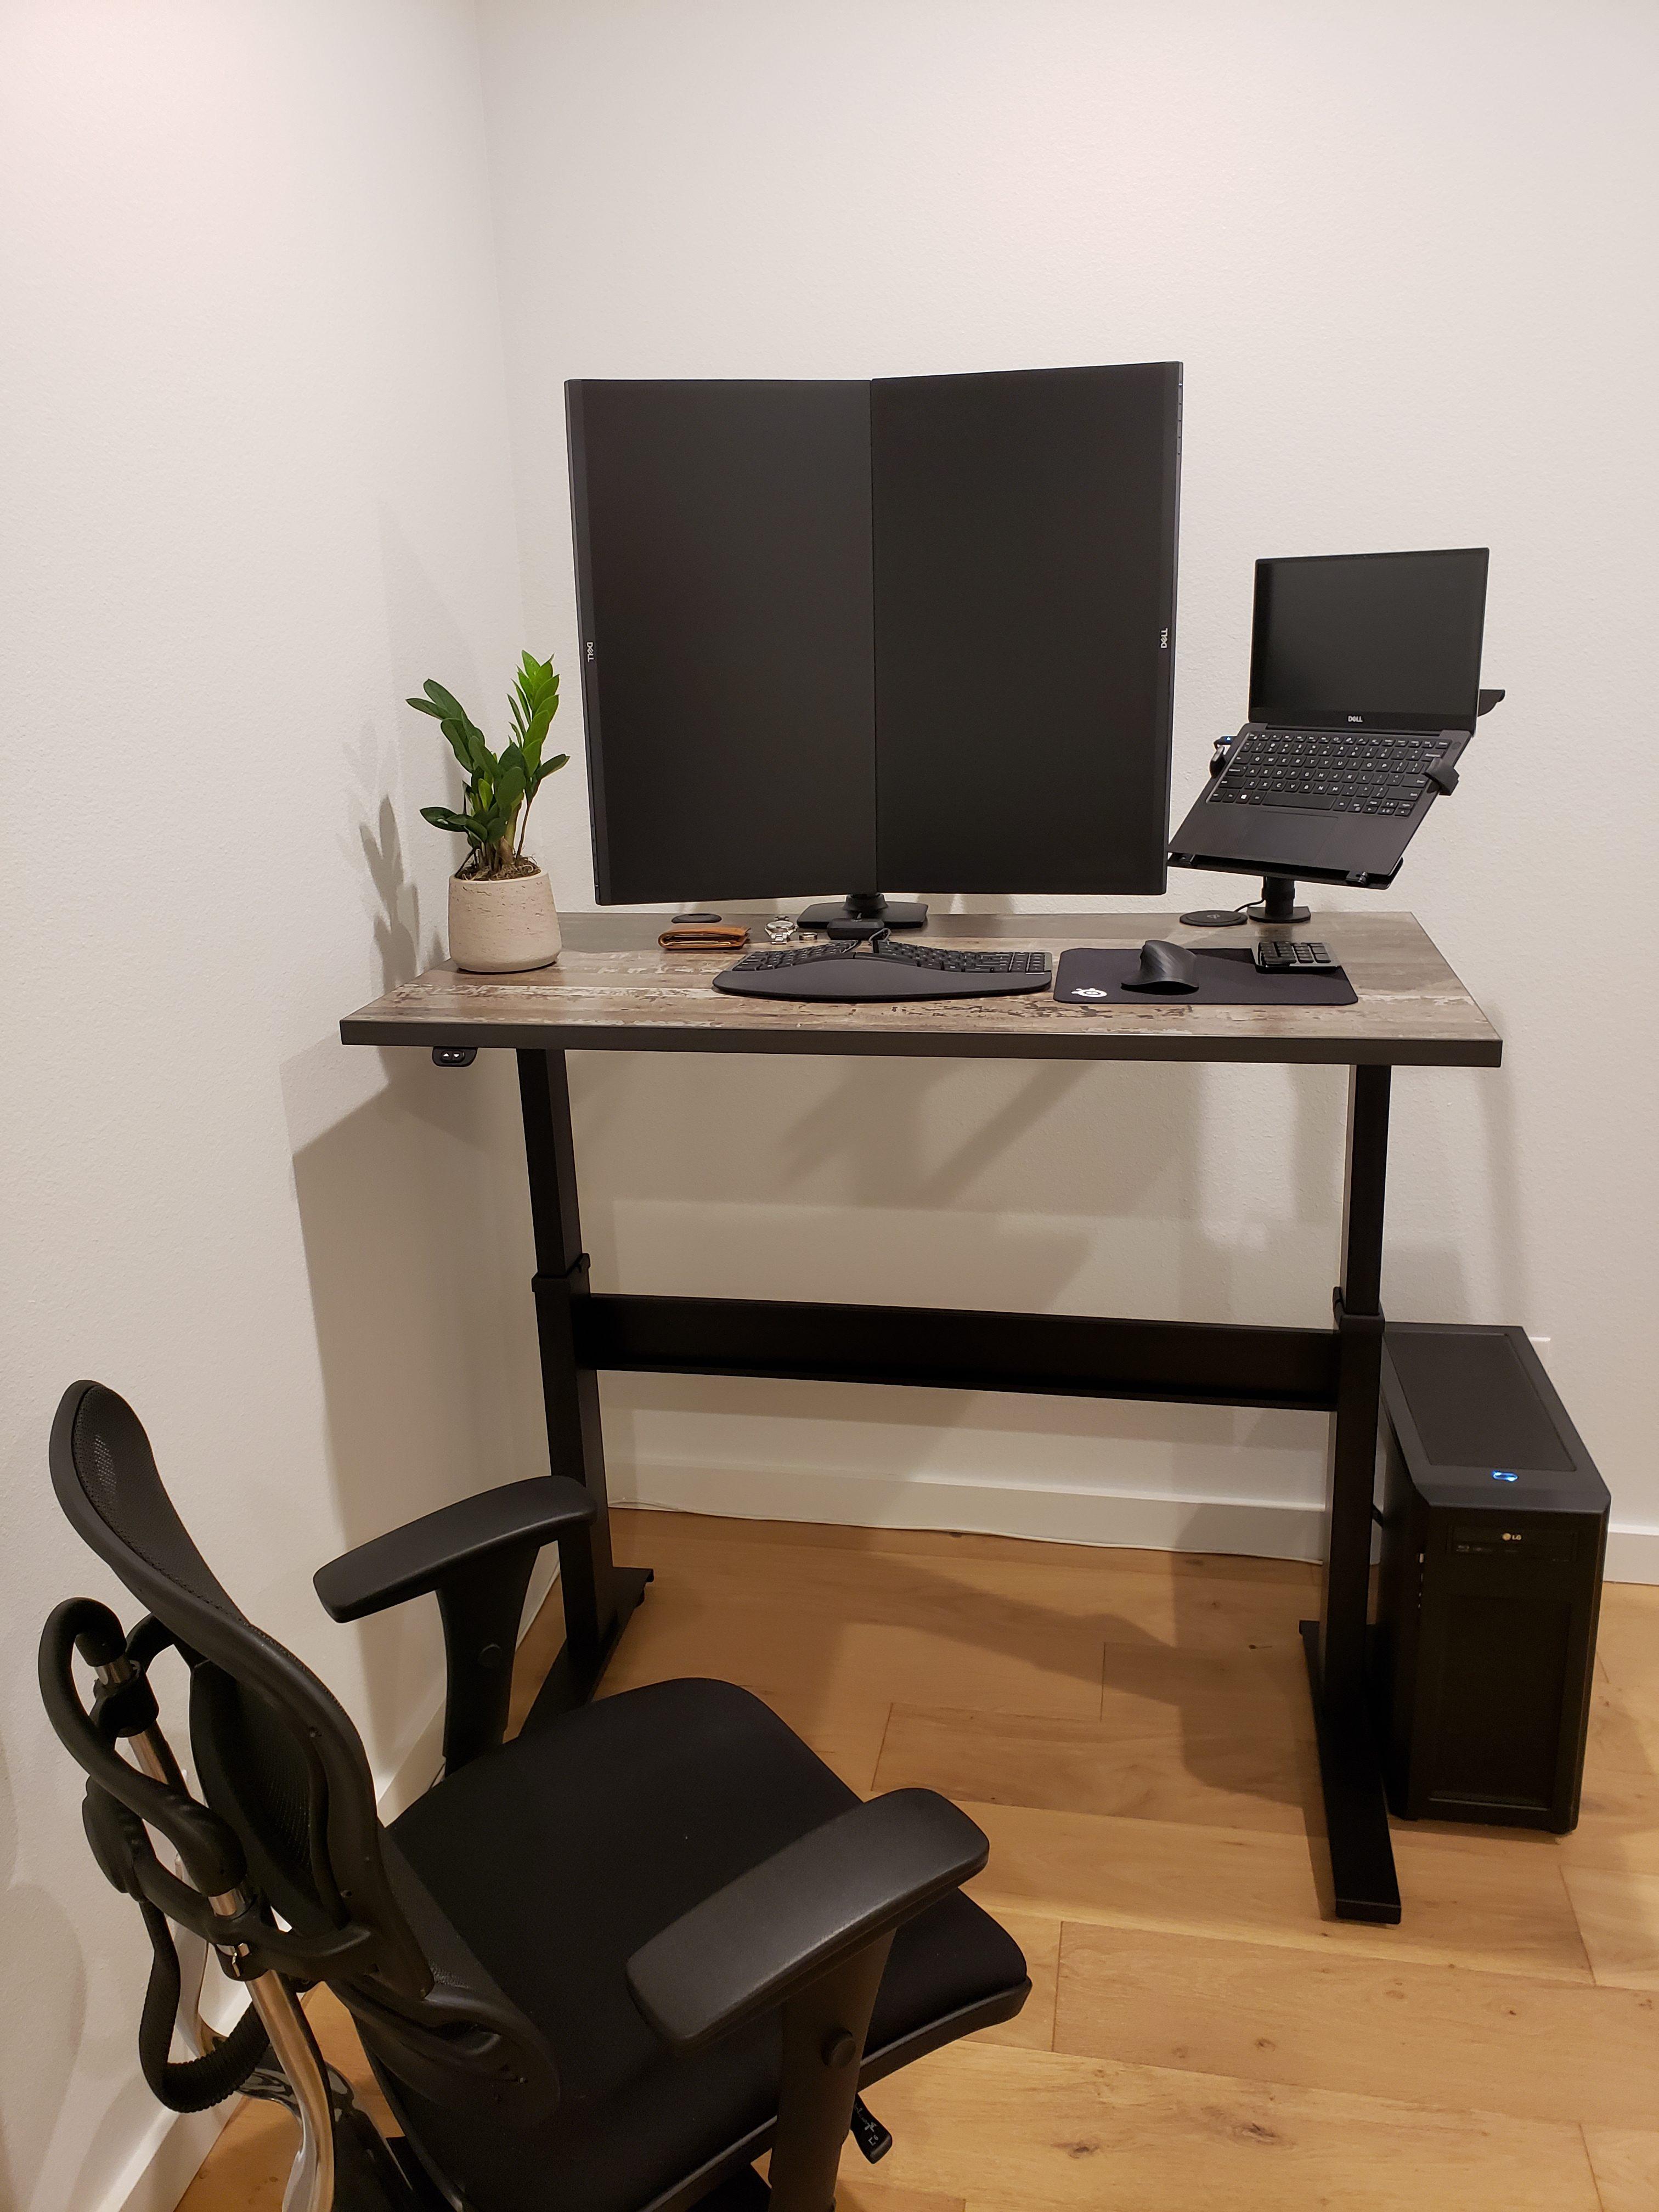 "25"" x 48"" Reclamation Maple Laminate Top with Black VertDesk Standing Desk Frame"